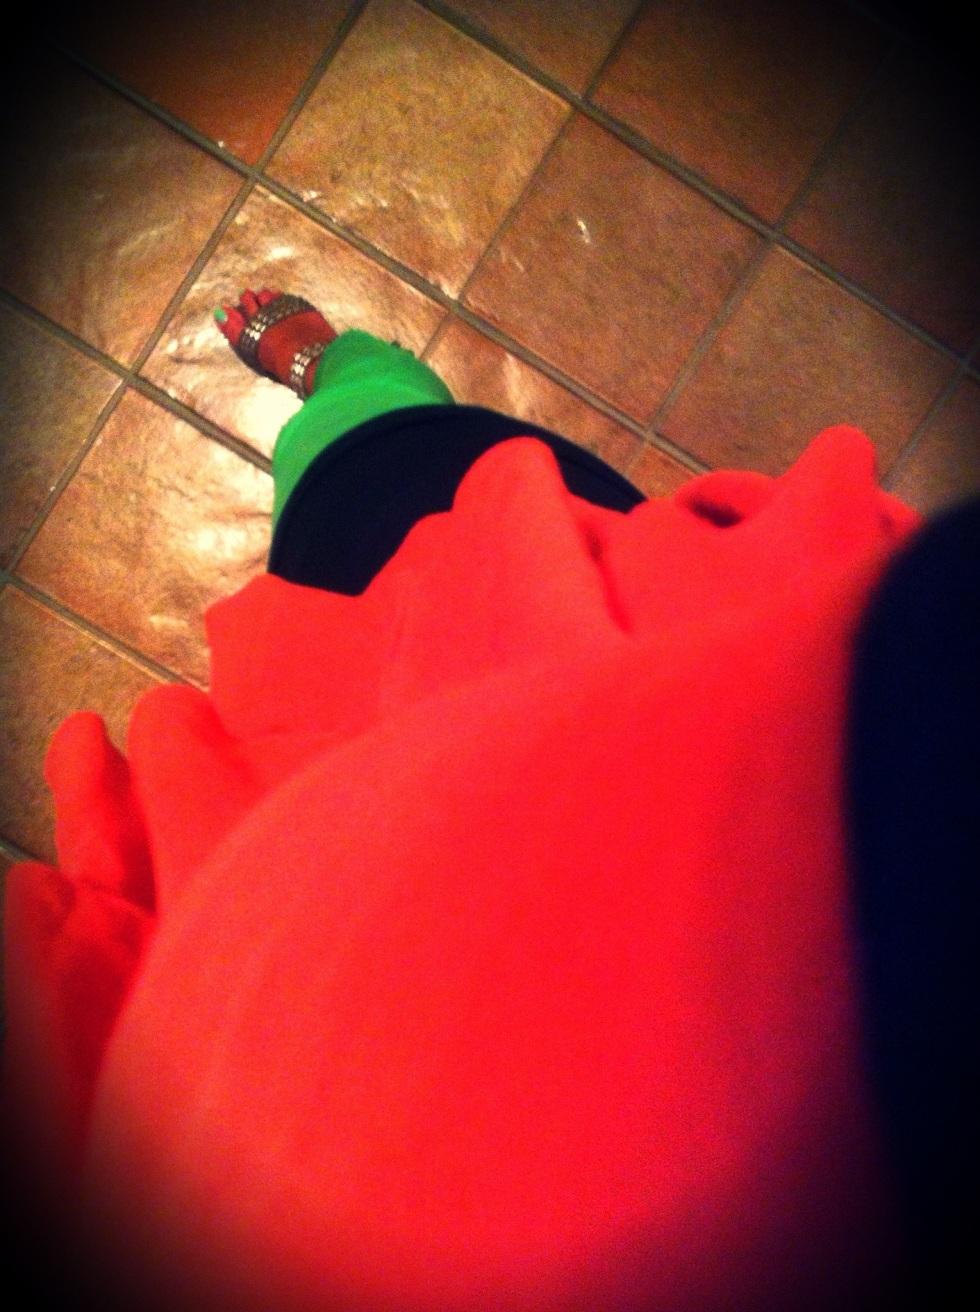 Canotta nera, Manila Grace, Blusa rossa Manila Grace, Pantaloni verdi Zara, Sandali borchiati Ash, Smalto verde tiffany, Debby Colorplay 81, italia street style, sicily street style, sicilia street style, beach style